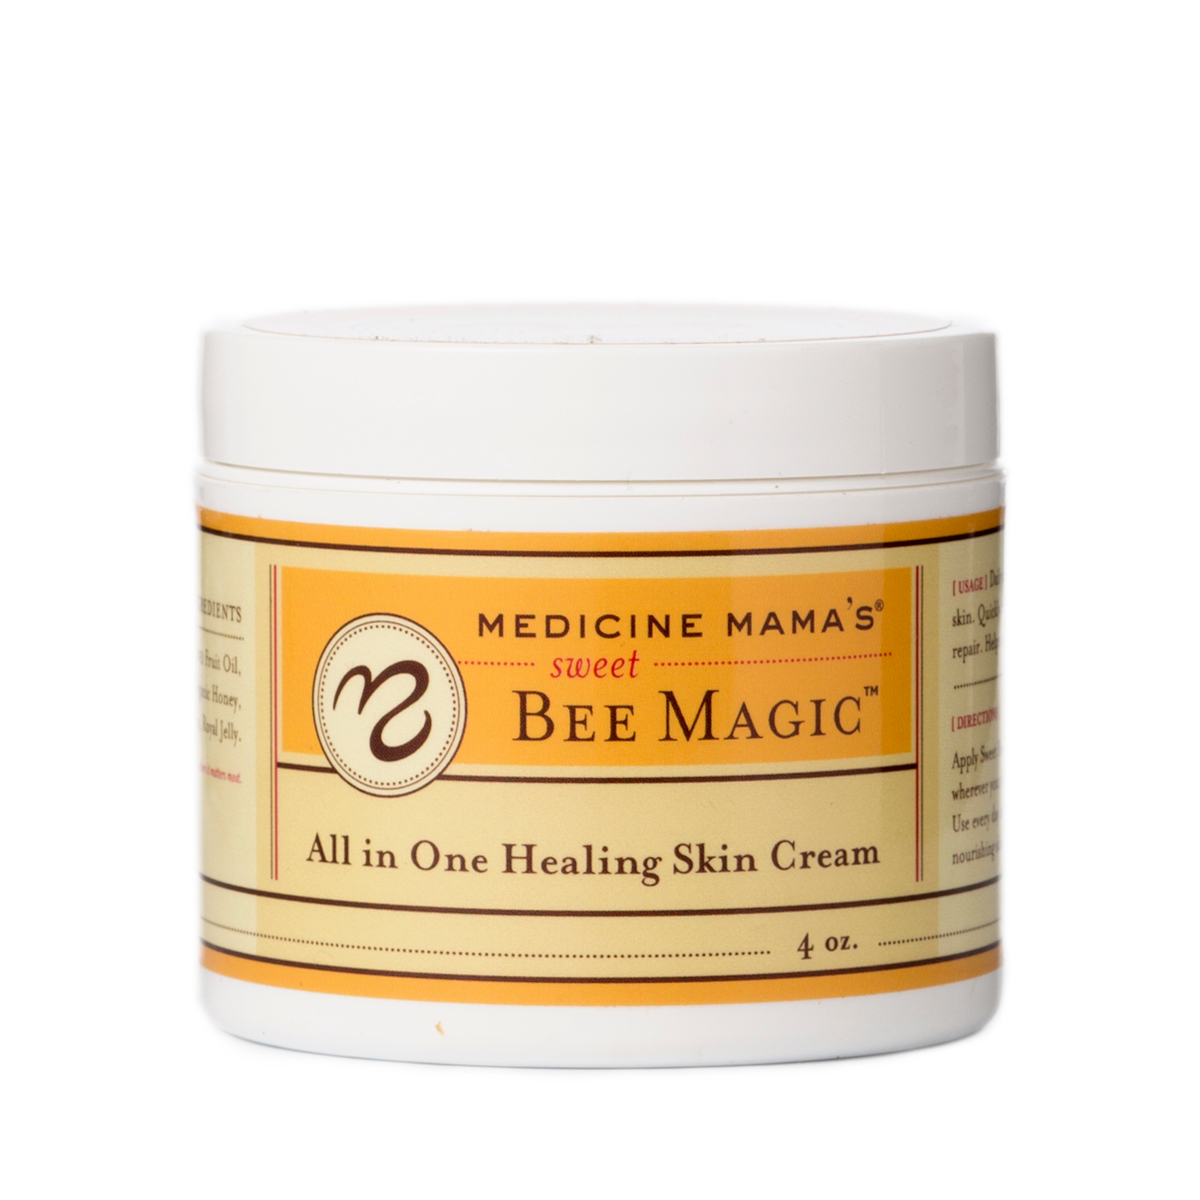 Sweet Bee Magic All In One Healing Skin Cream